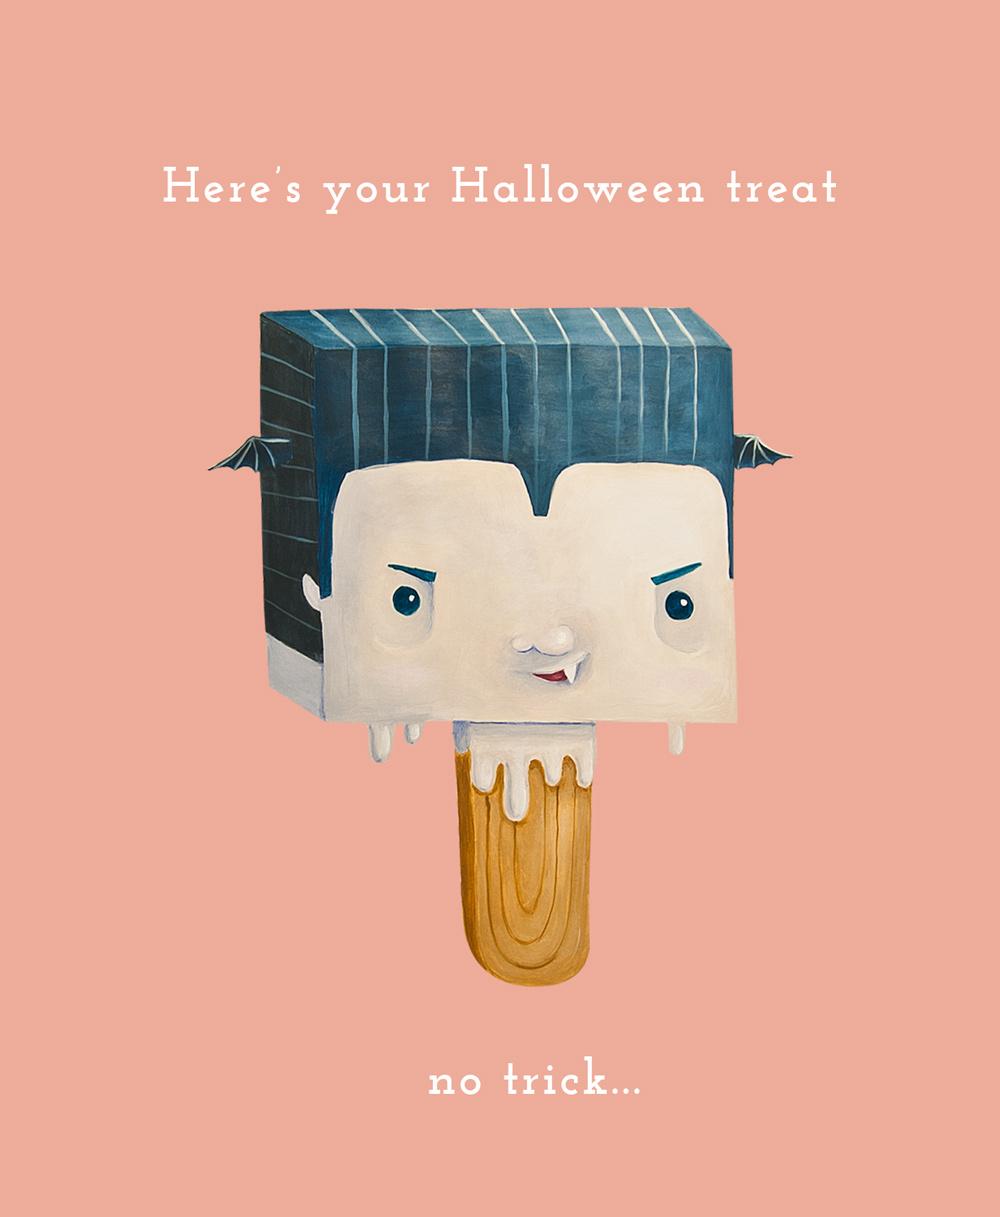 freebie halloween card ecard trick treat funny cute vampire